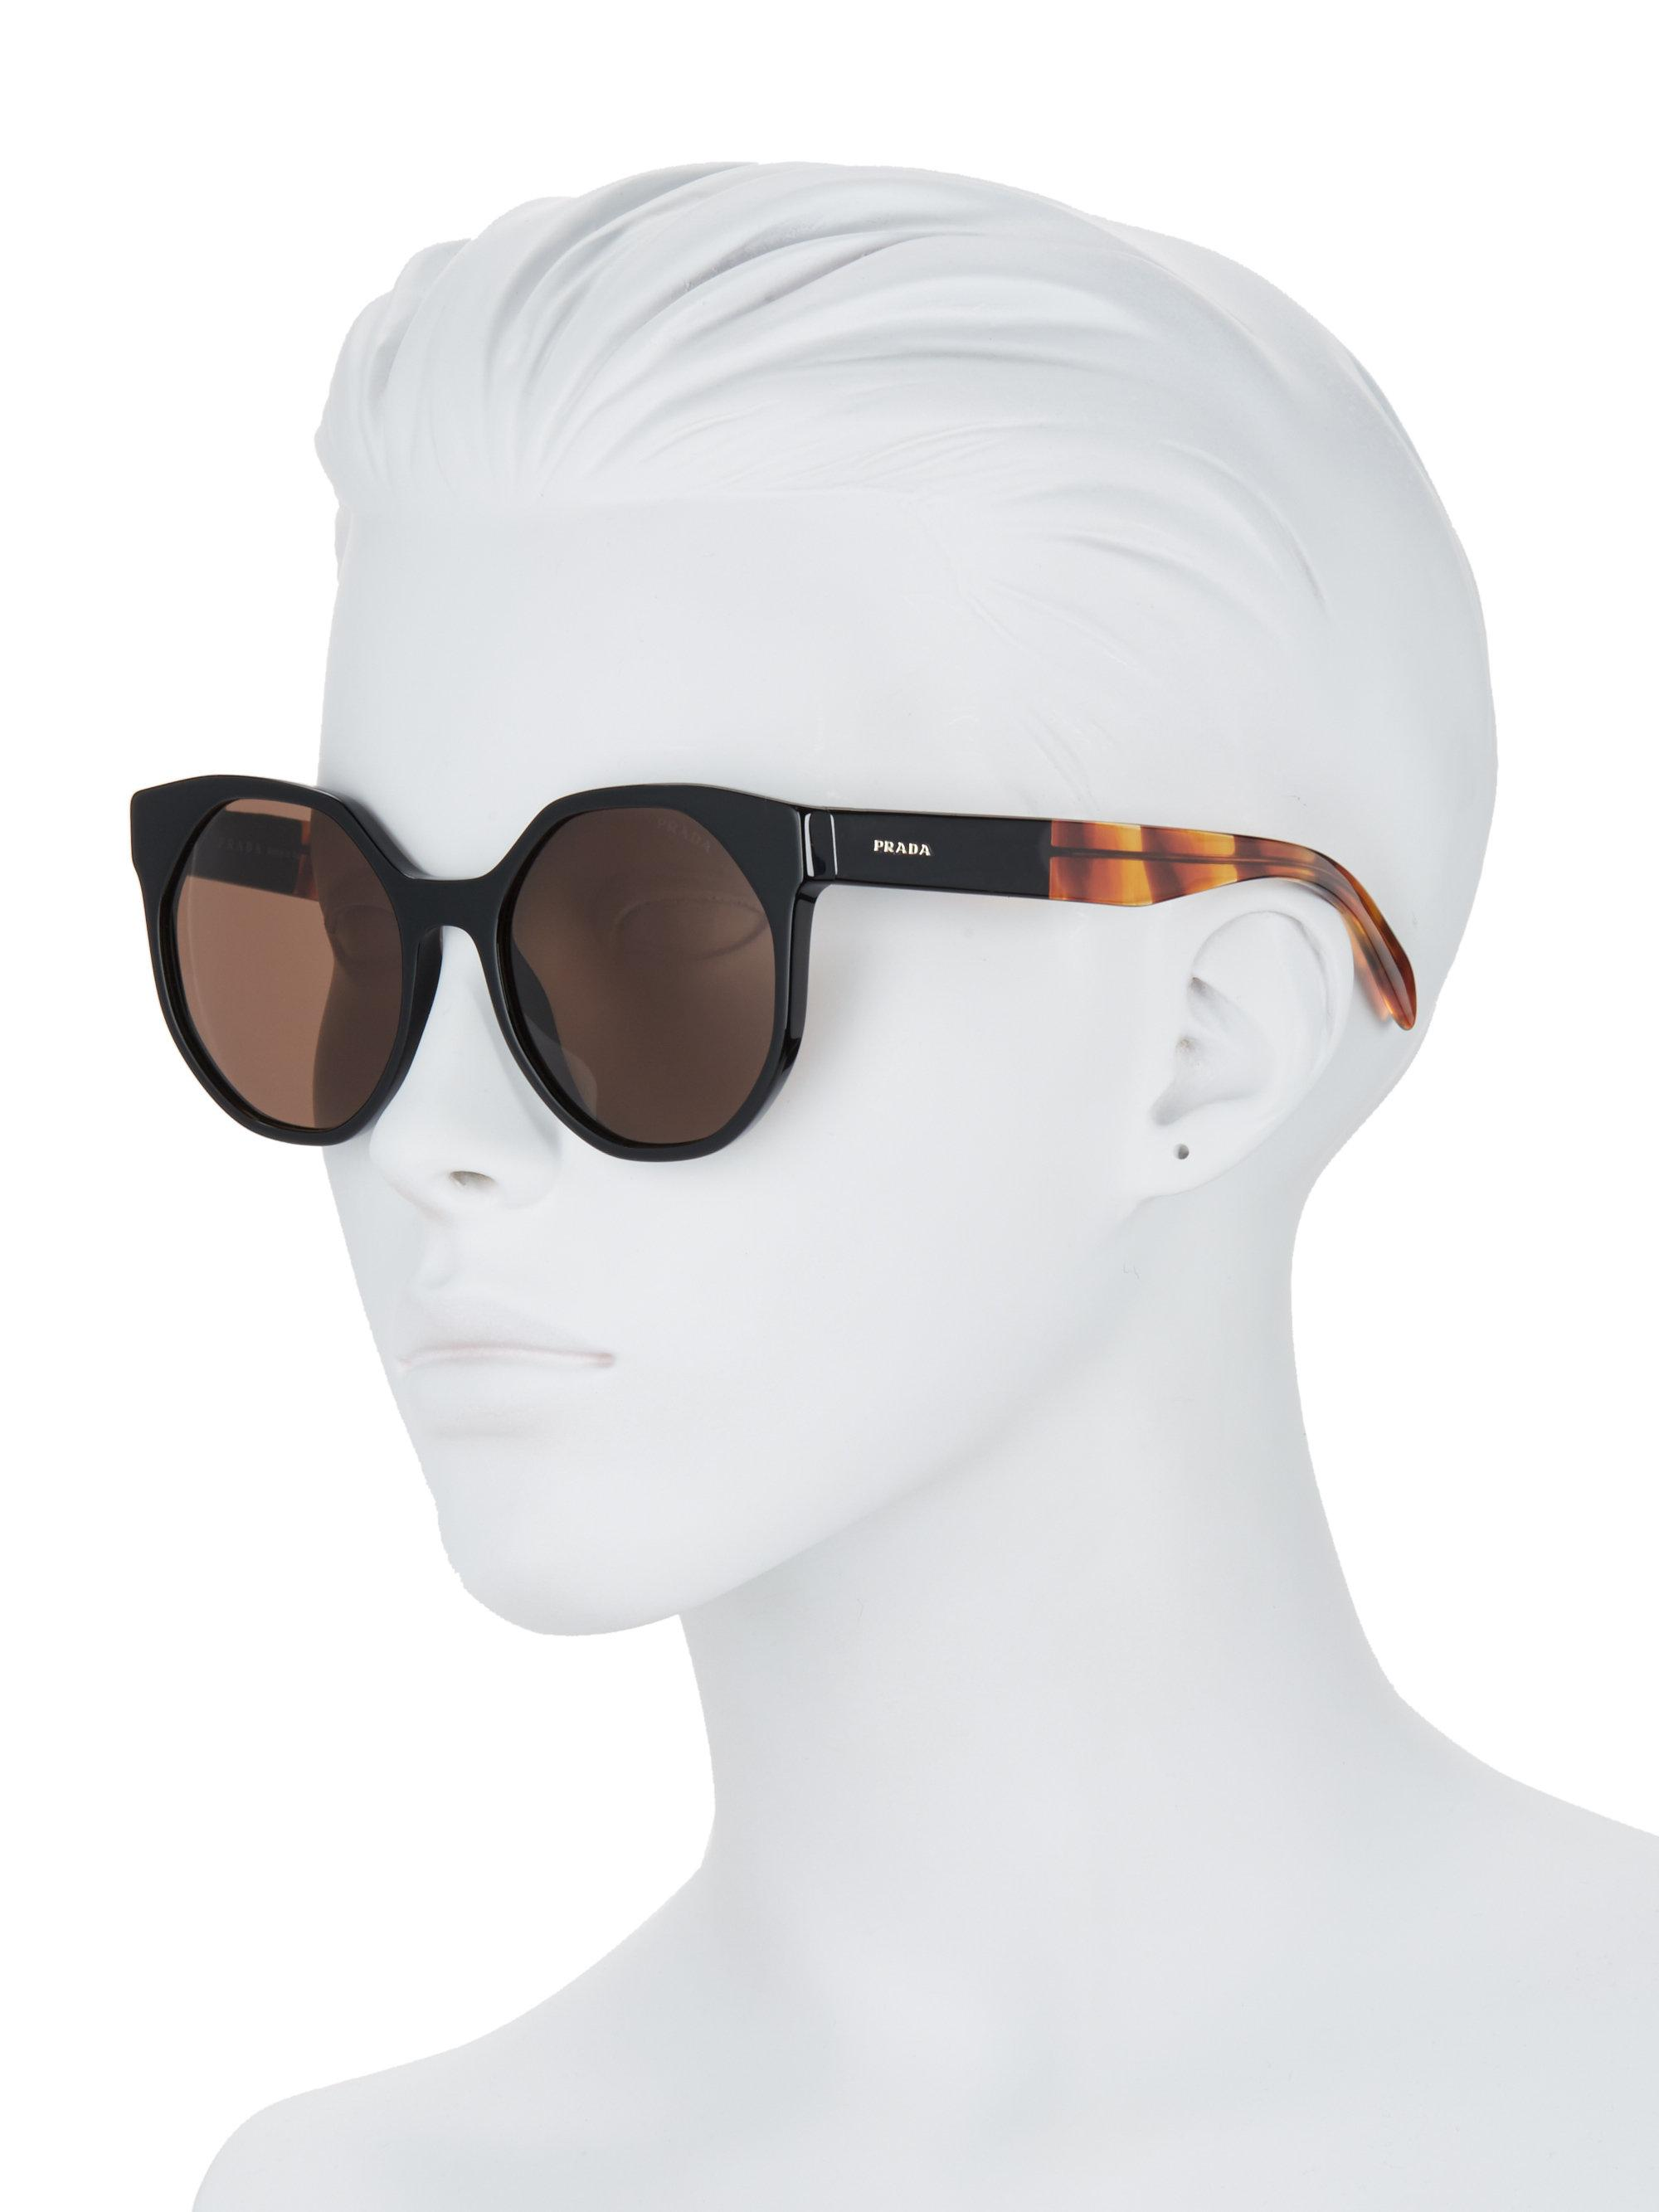 33afaf2c9 ... usa prada multicolor 55mm round cat eye sunglasses lyst. view  fullscreen 9556e 2ee9e